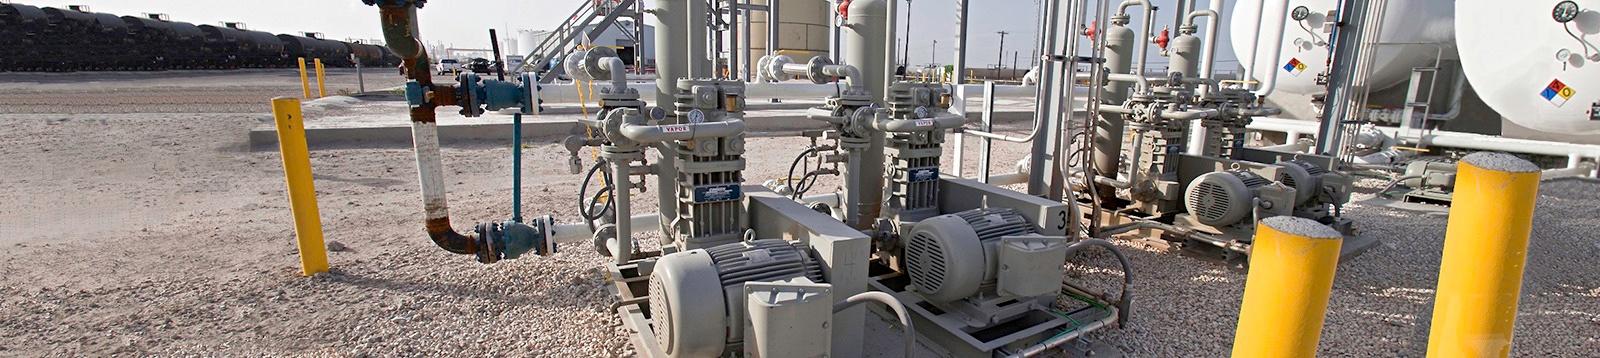 NGL LPG Propane Butane Pumps and Compressors 6.jpg